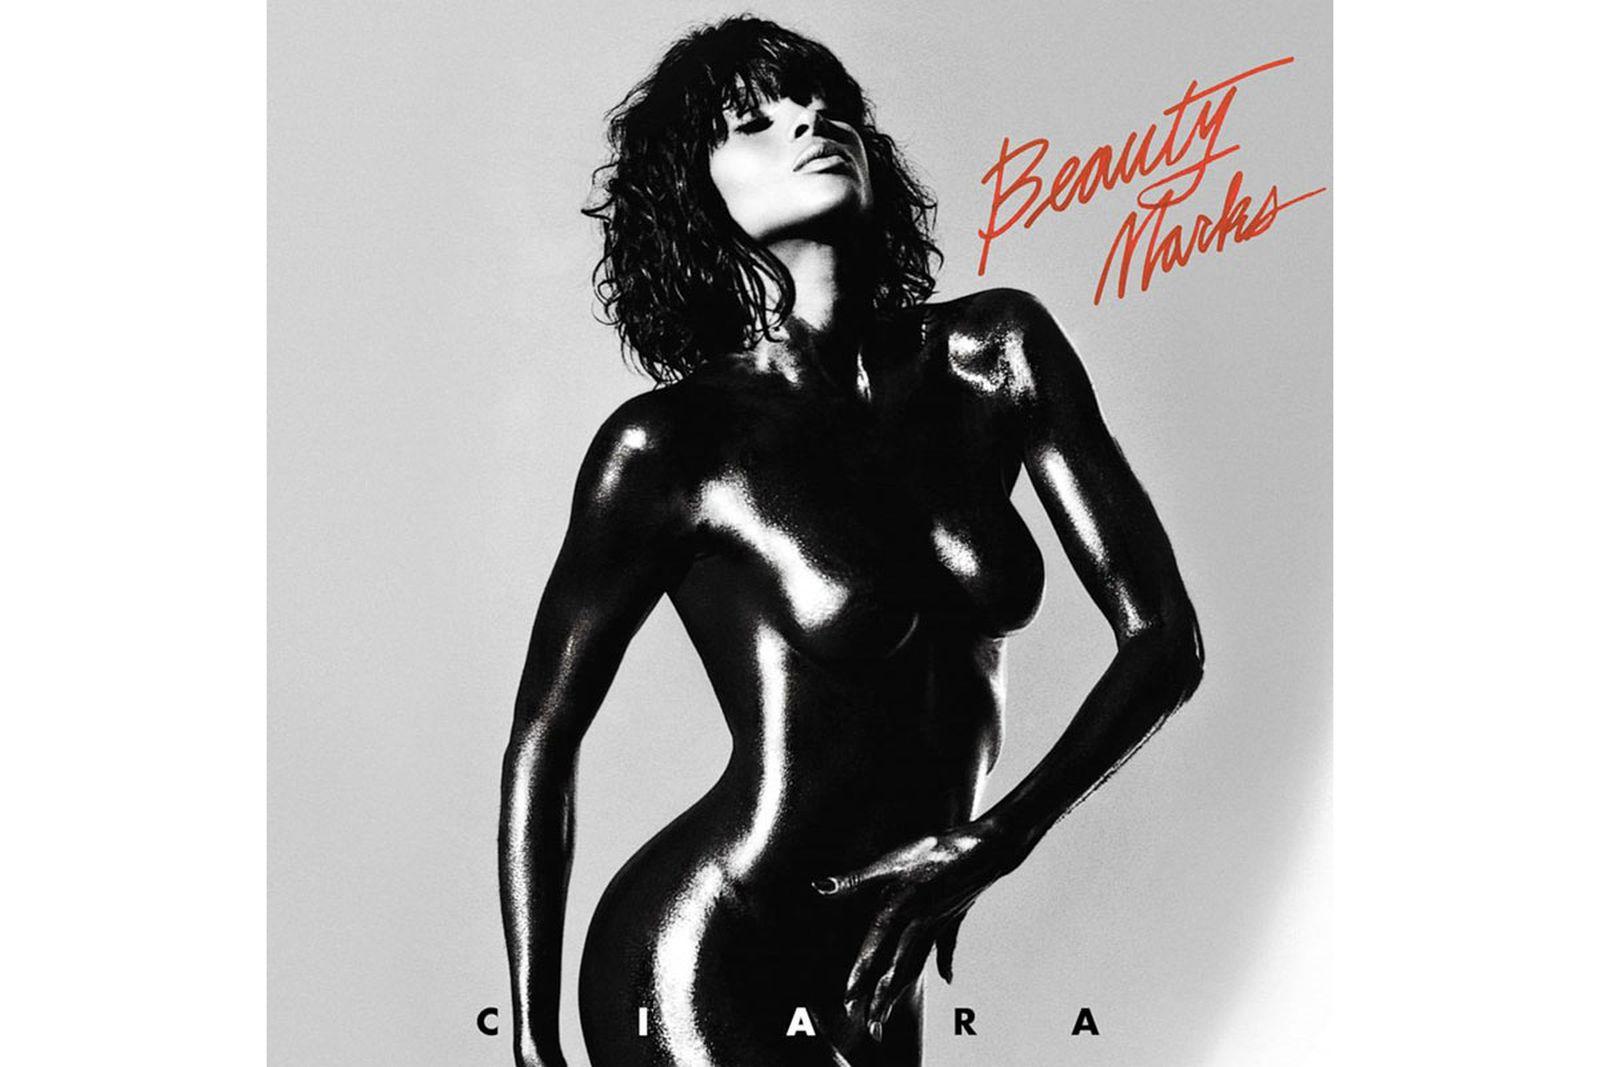 ciara beauty marks review